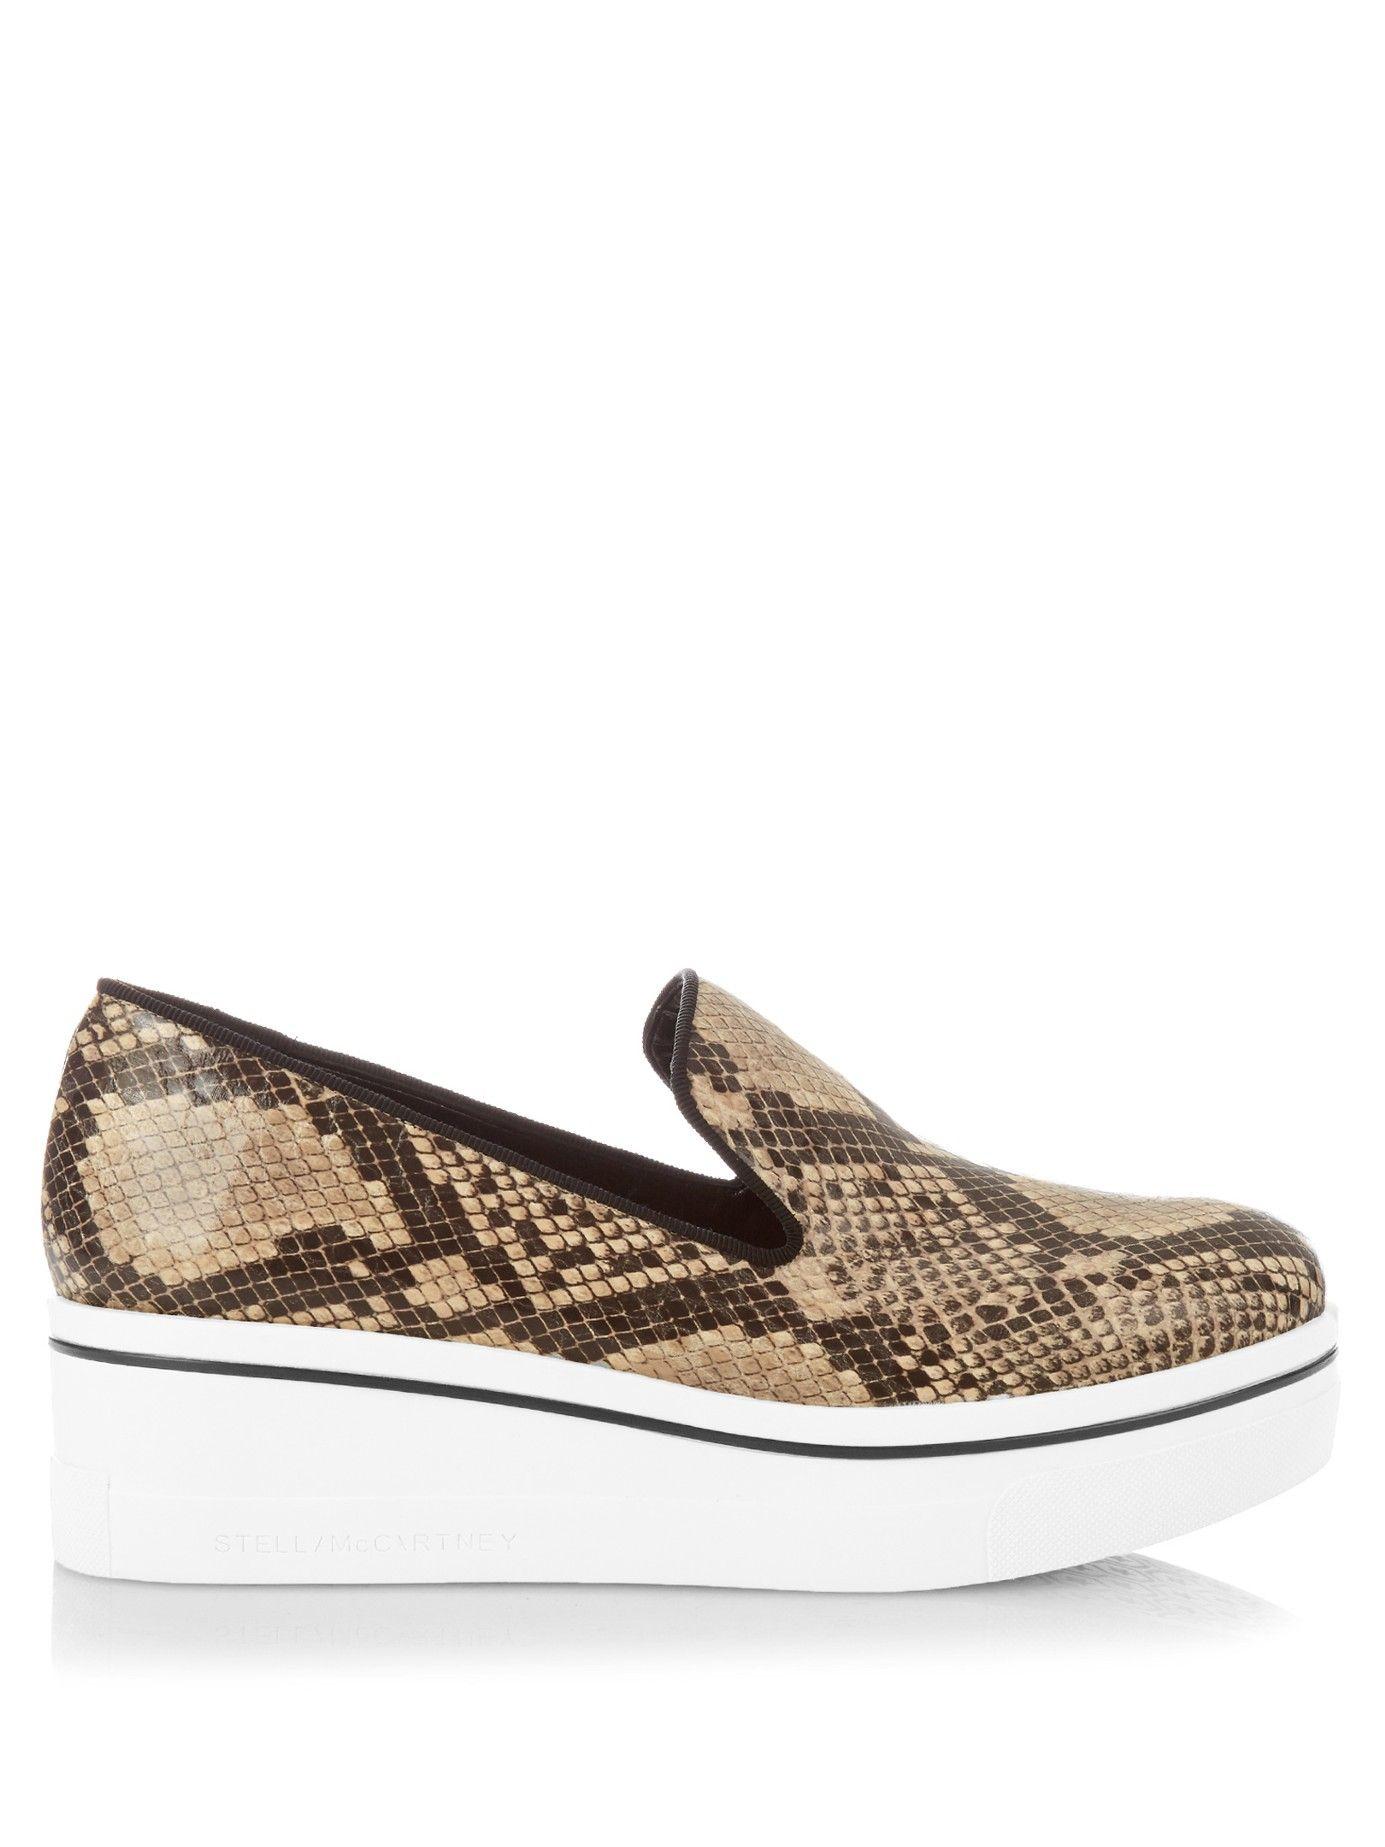 41fe66ffb7472 Binx faux-python flatform loafers | Stella McCartney | MATCHESFASHION.COM UK